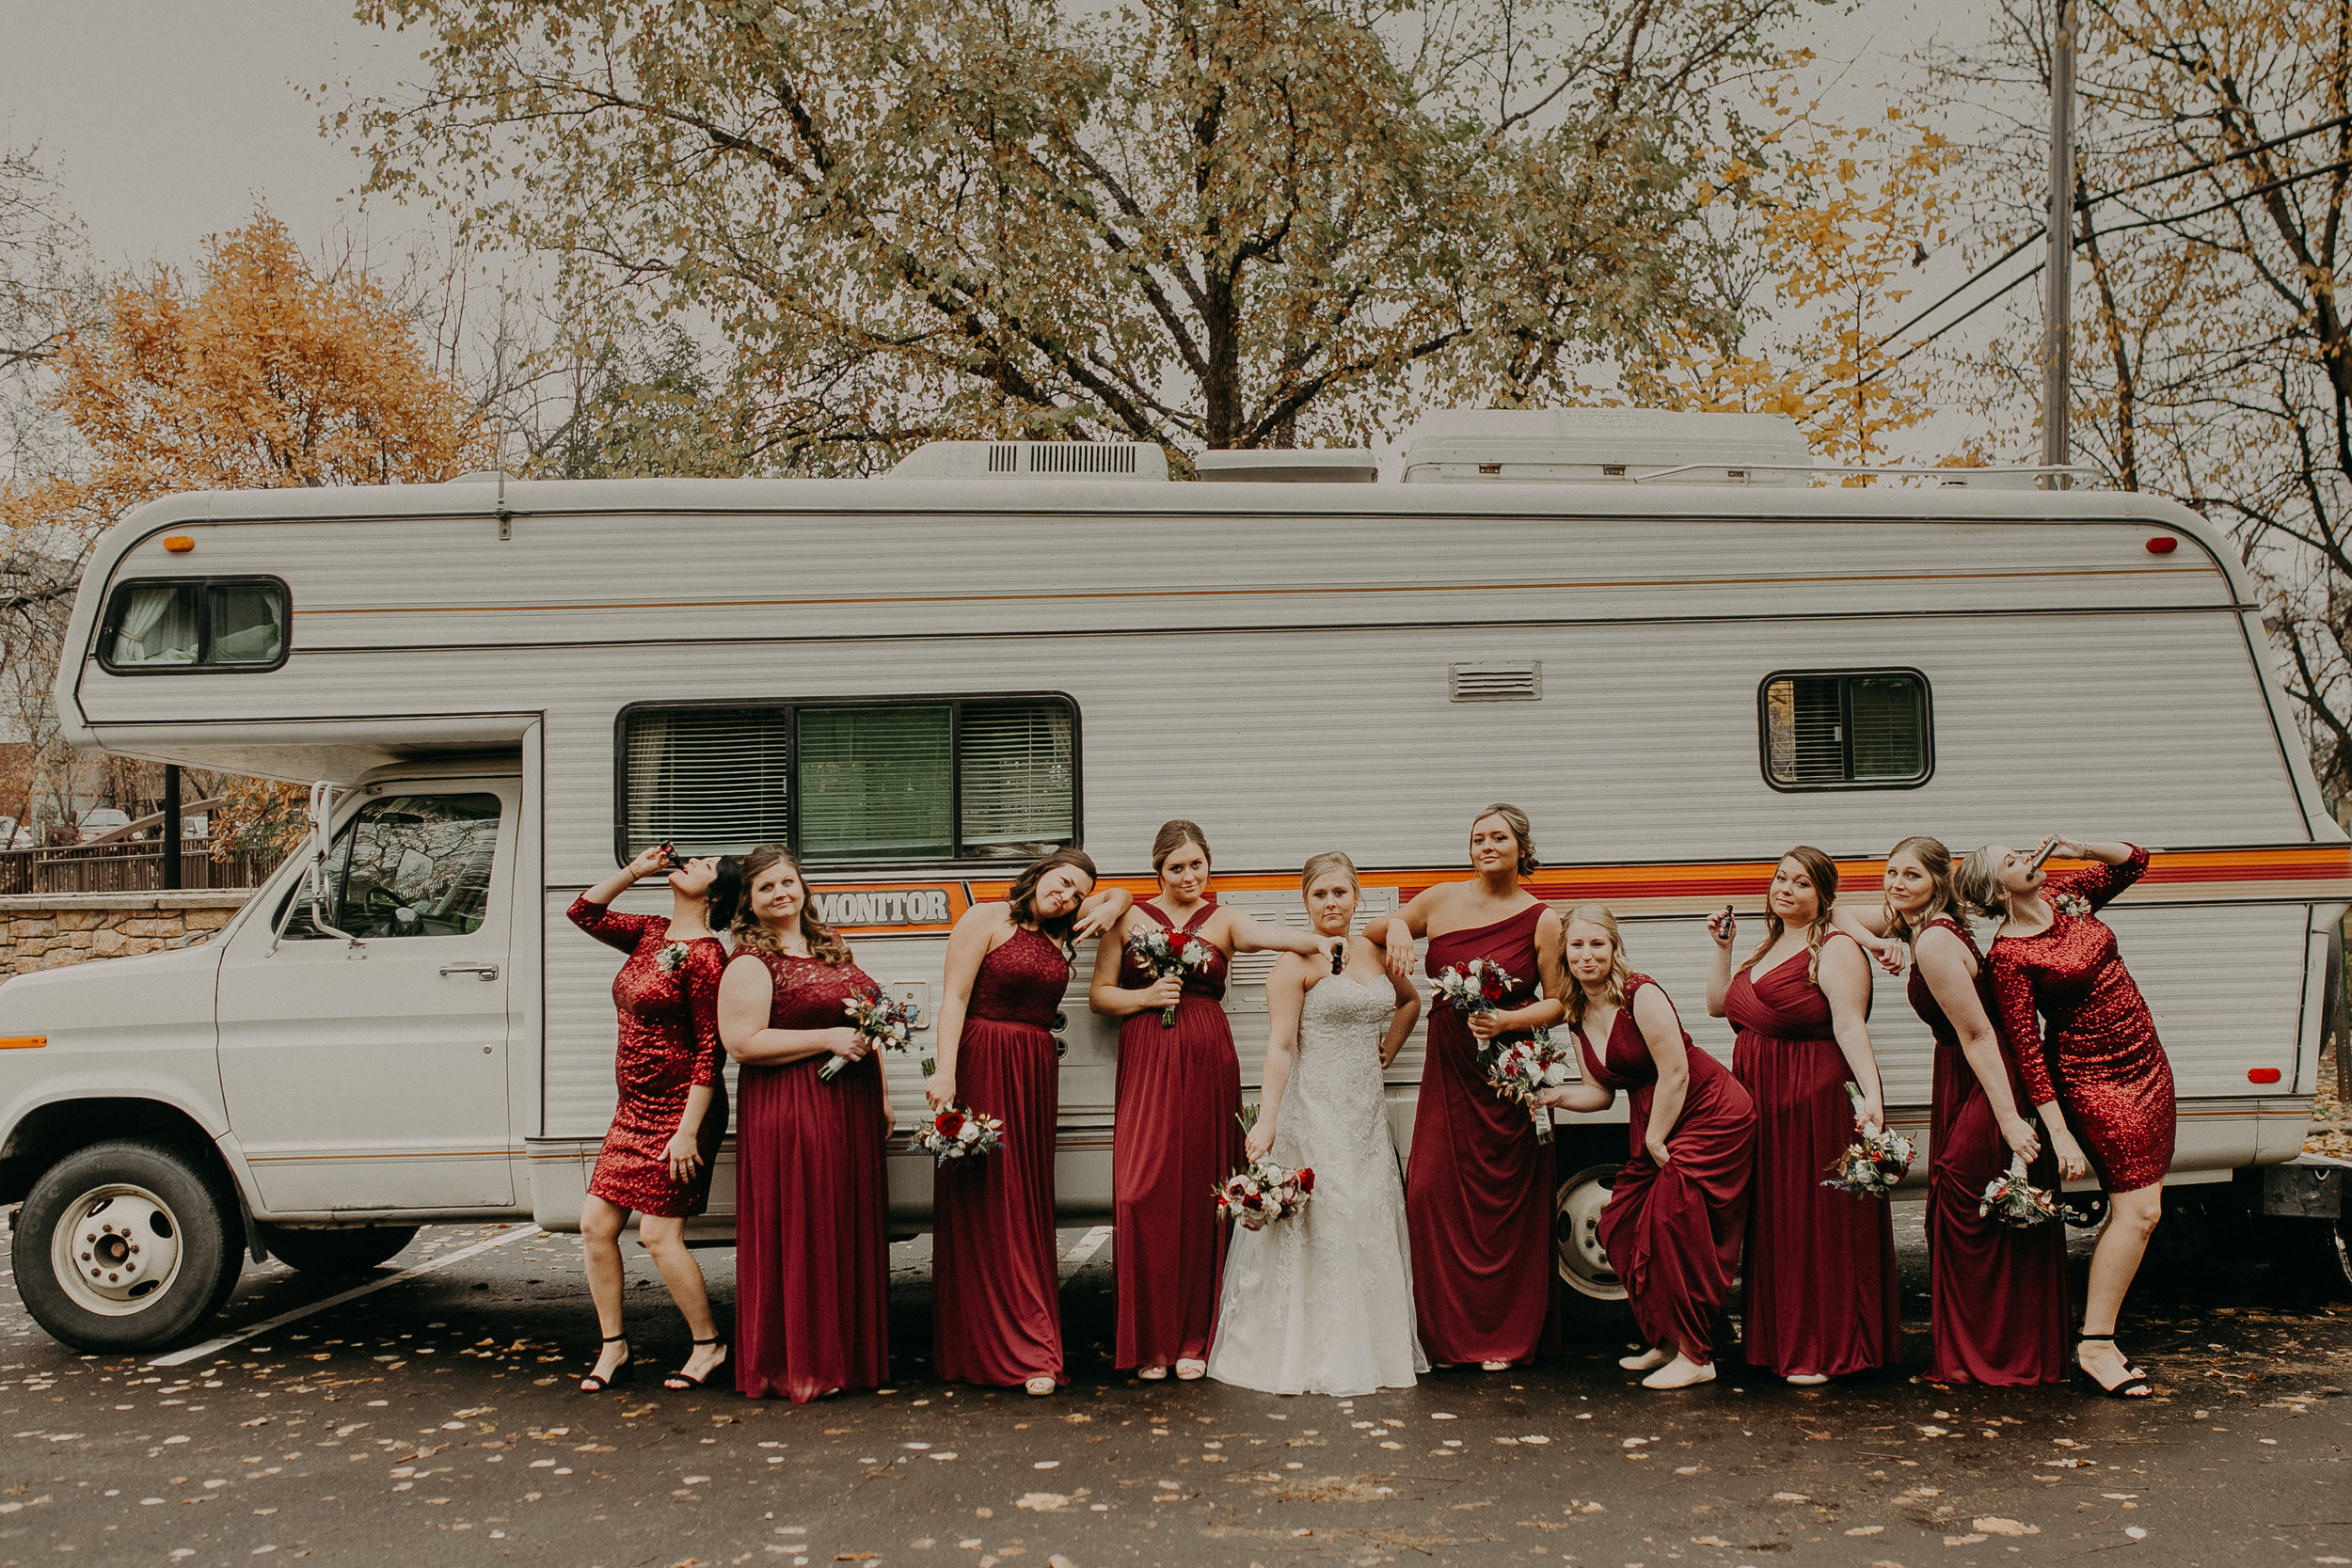 heritage-park-rv-bridesmaids-river-falls-photographer